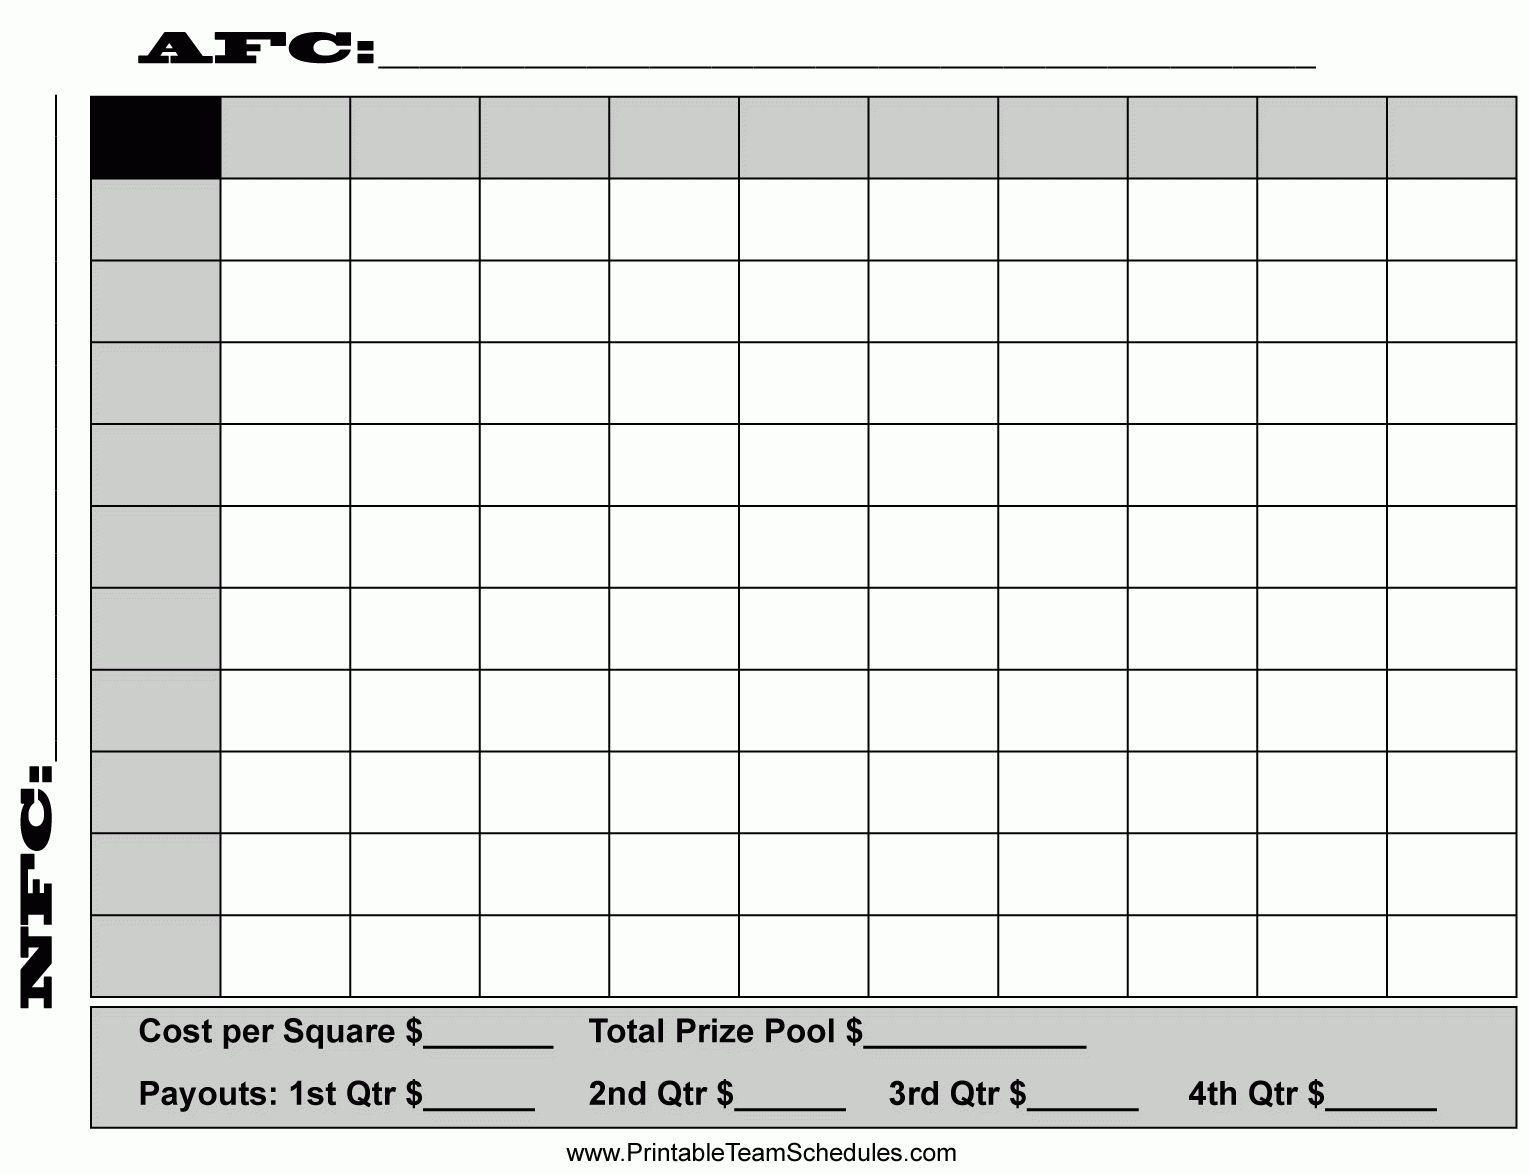 Football box score betting matrix sports insights nba betting trends